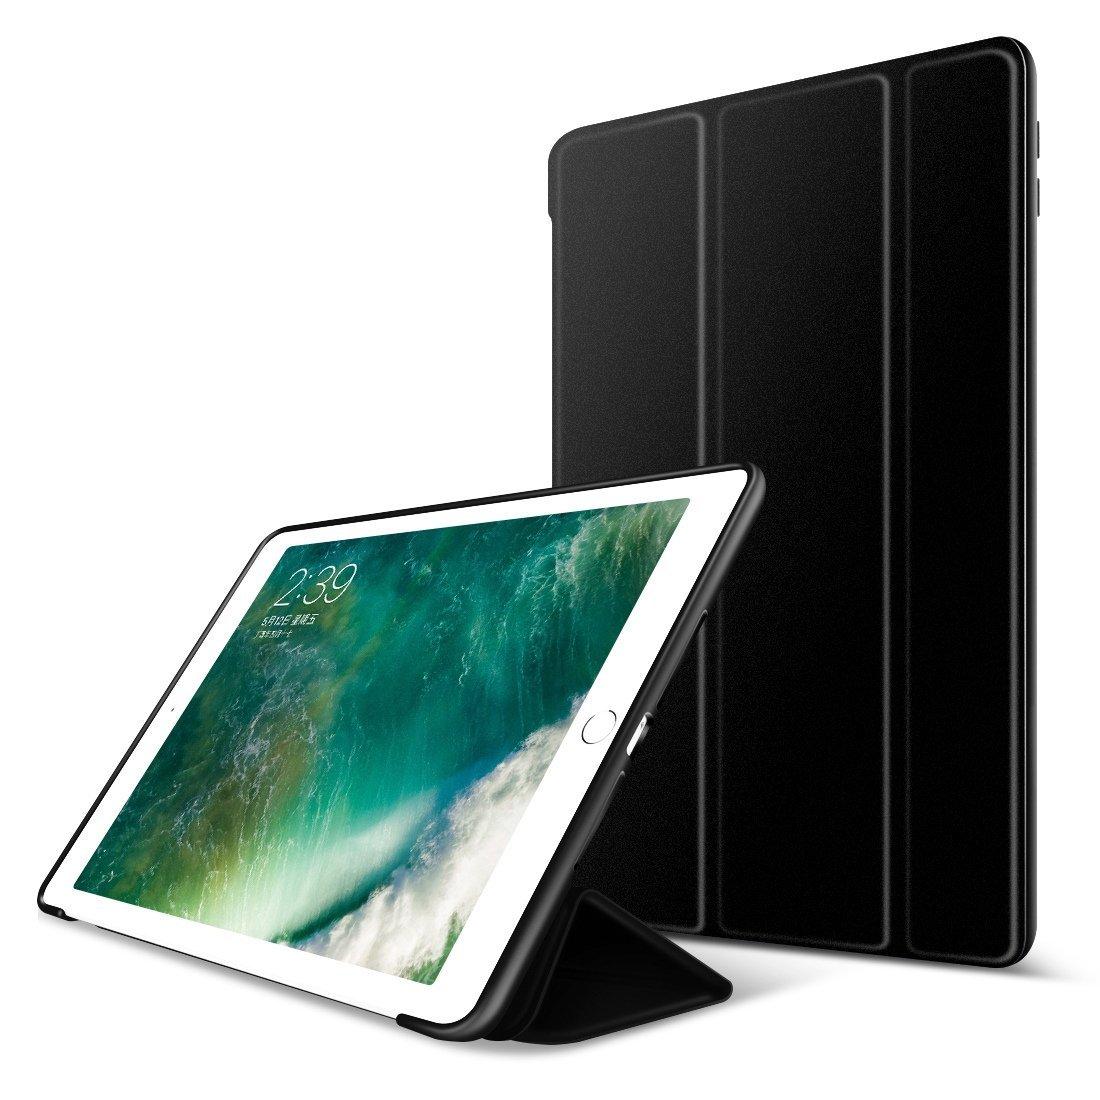 For 2017 Apple iPad Pro 10.5 Case, Slim Smart Case Folding Stand Auto Sleep/Wake Case Cover For  iPAD 10.5 PU + TPU back Case for ipad air 2 case slim pu leather silicone soft back smart cover sturdy stand auto sleep for ipad air2 ipad 6 coque stylus